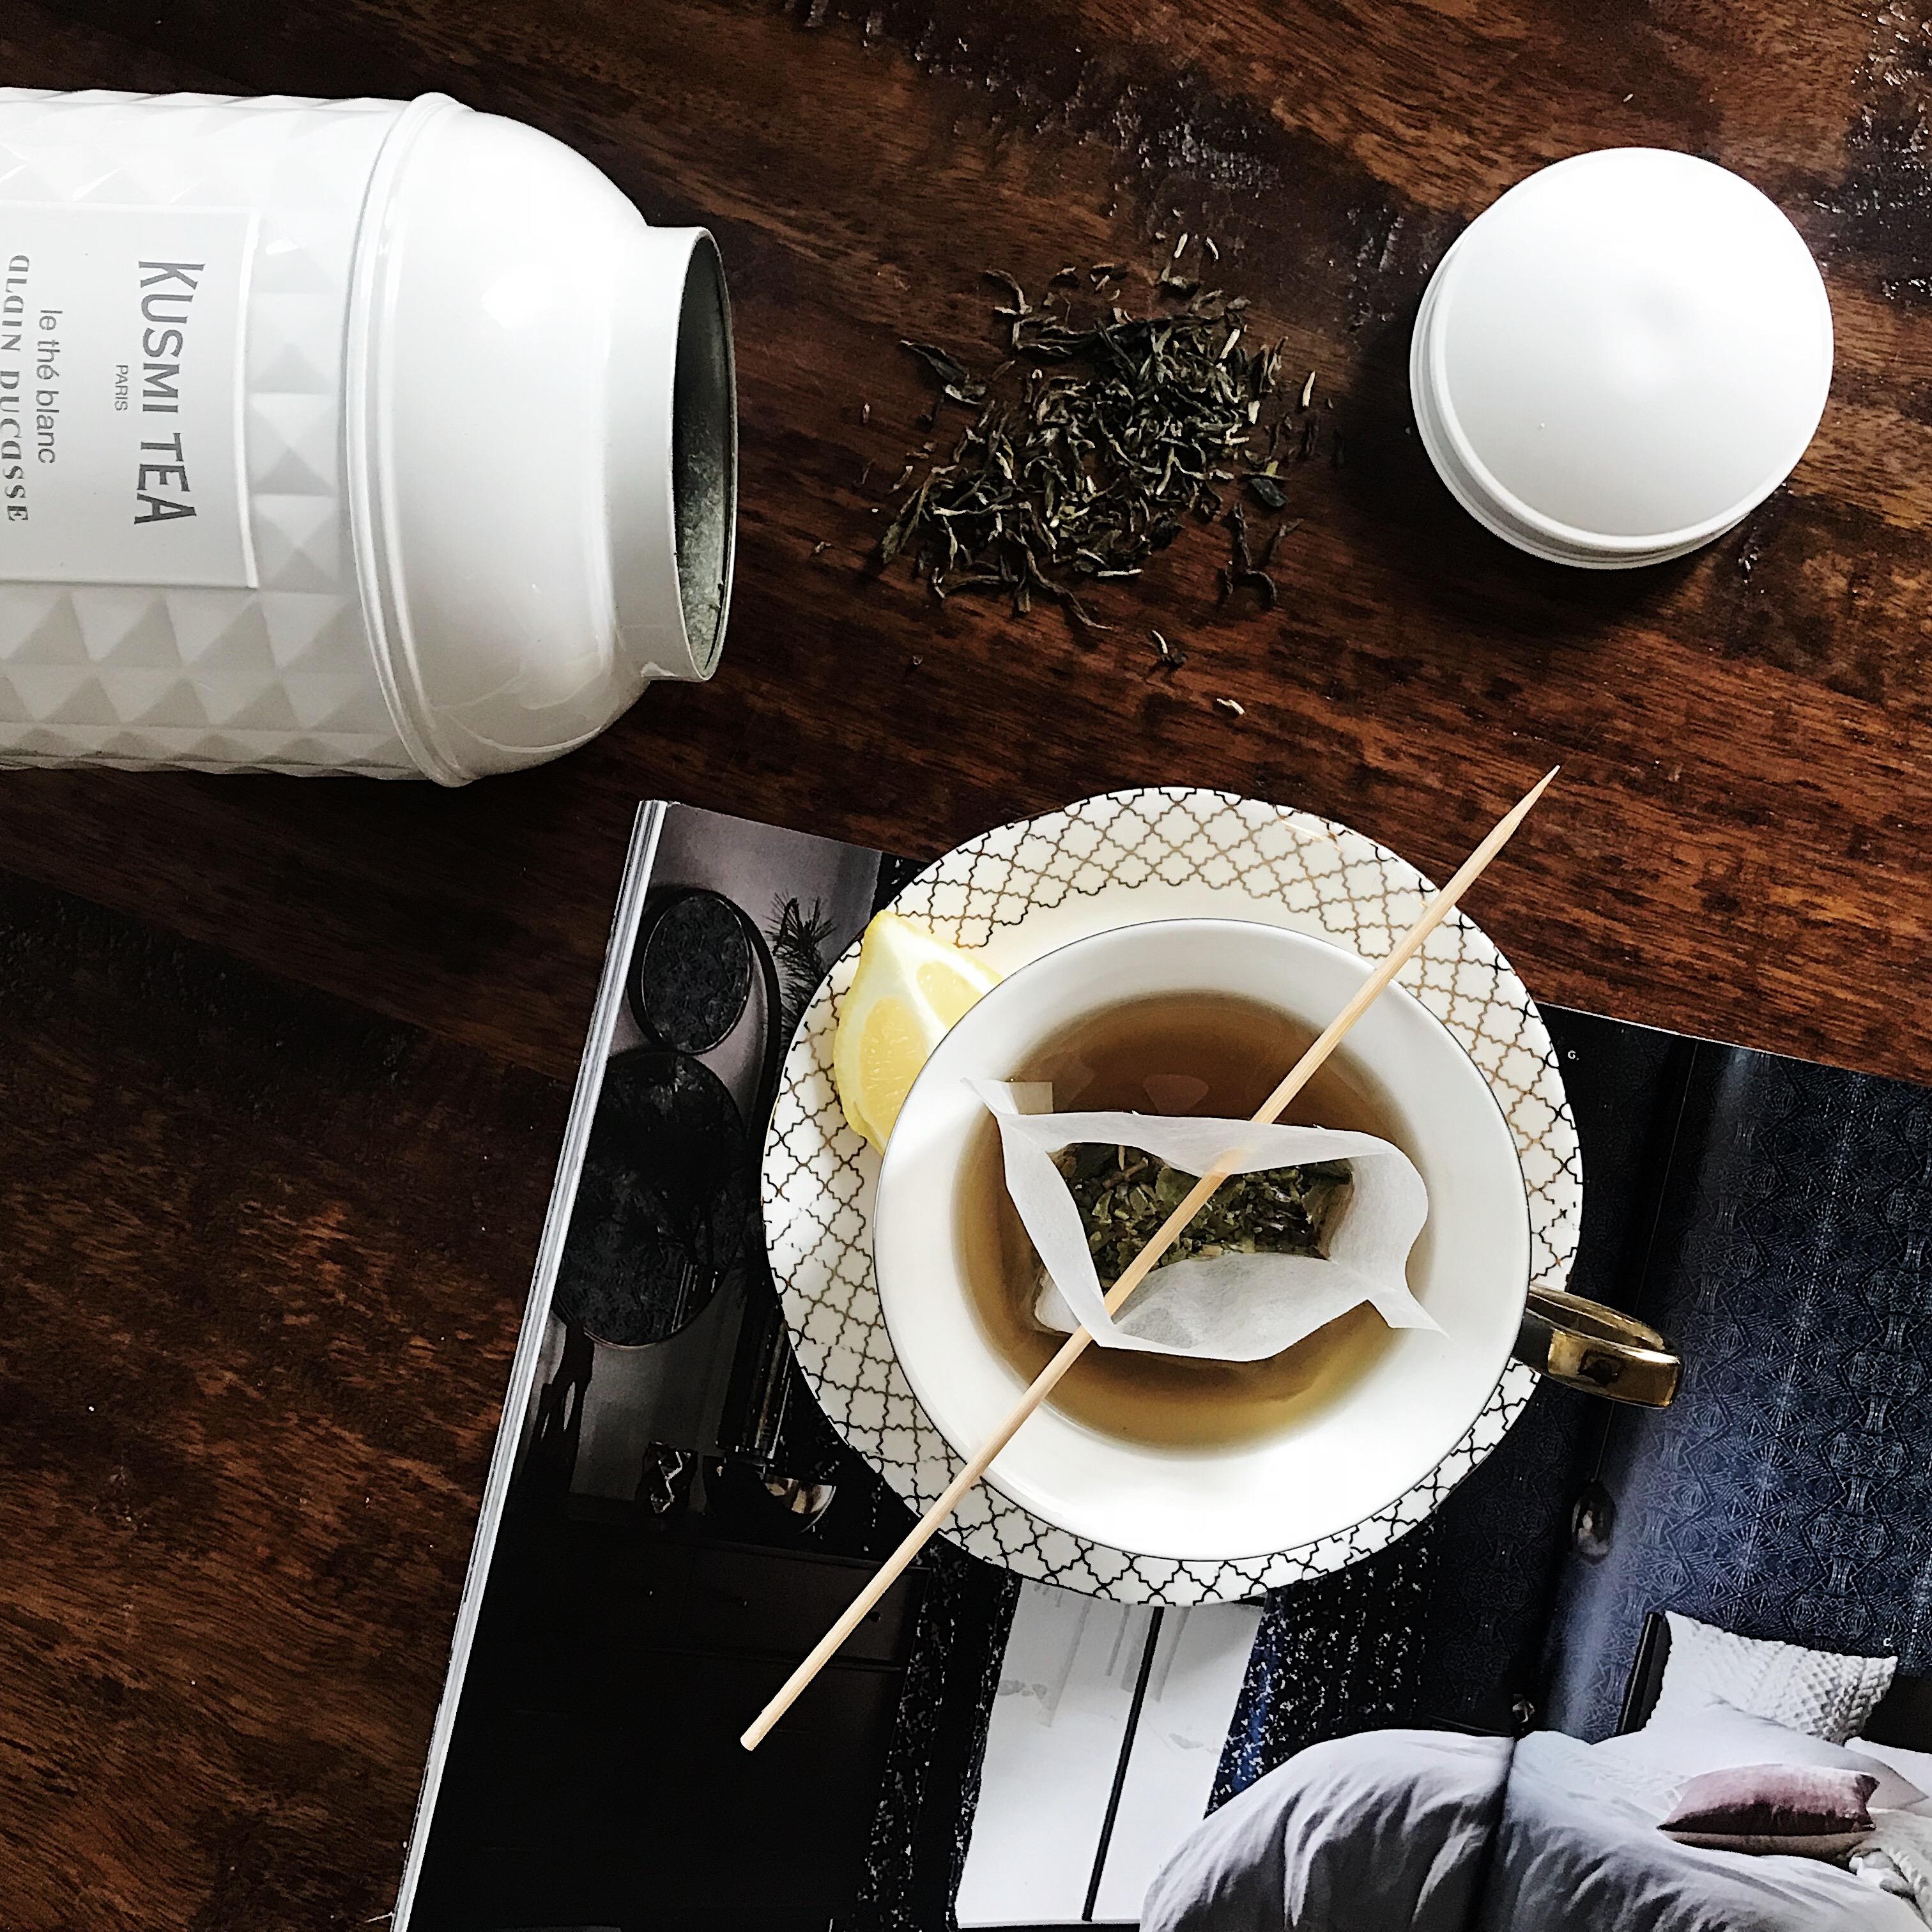 Freshly brewed Kusmi black Tea Sitting on a magazine.